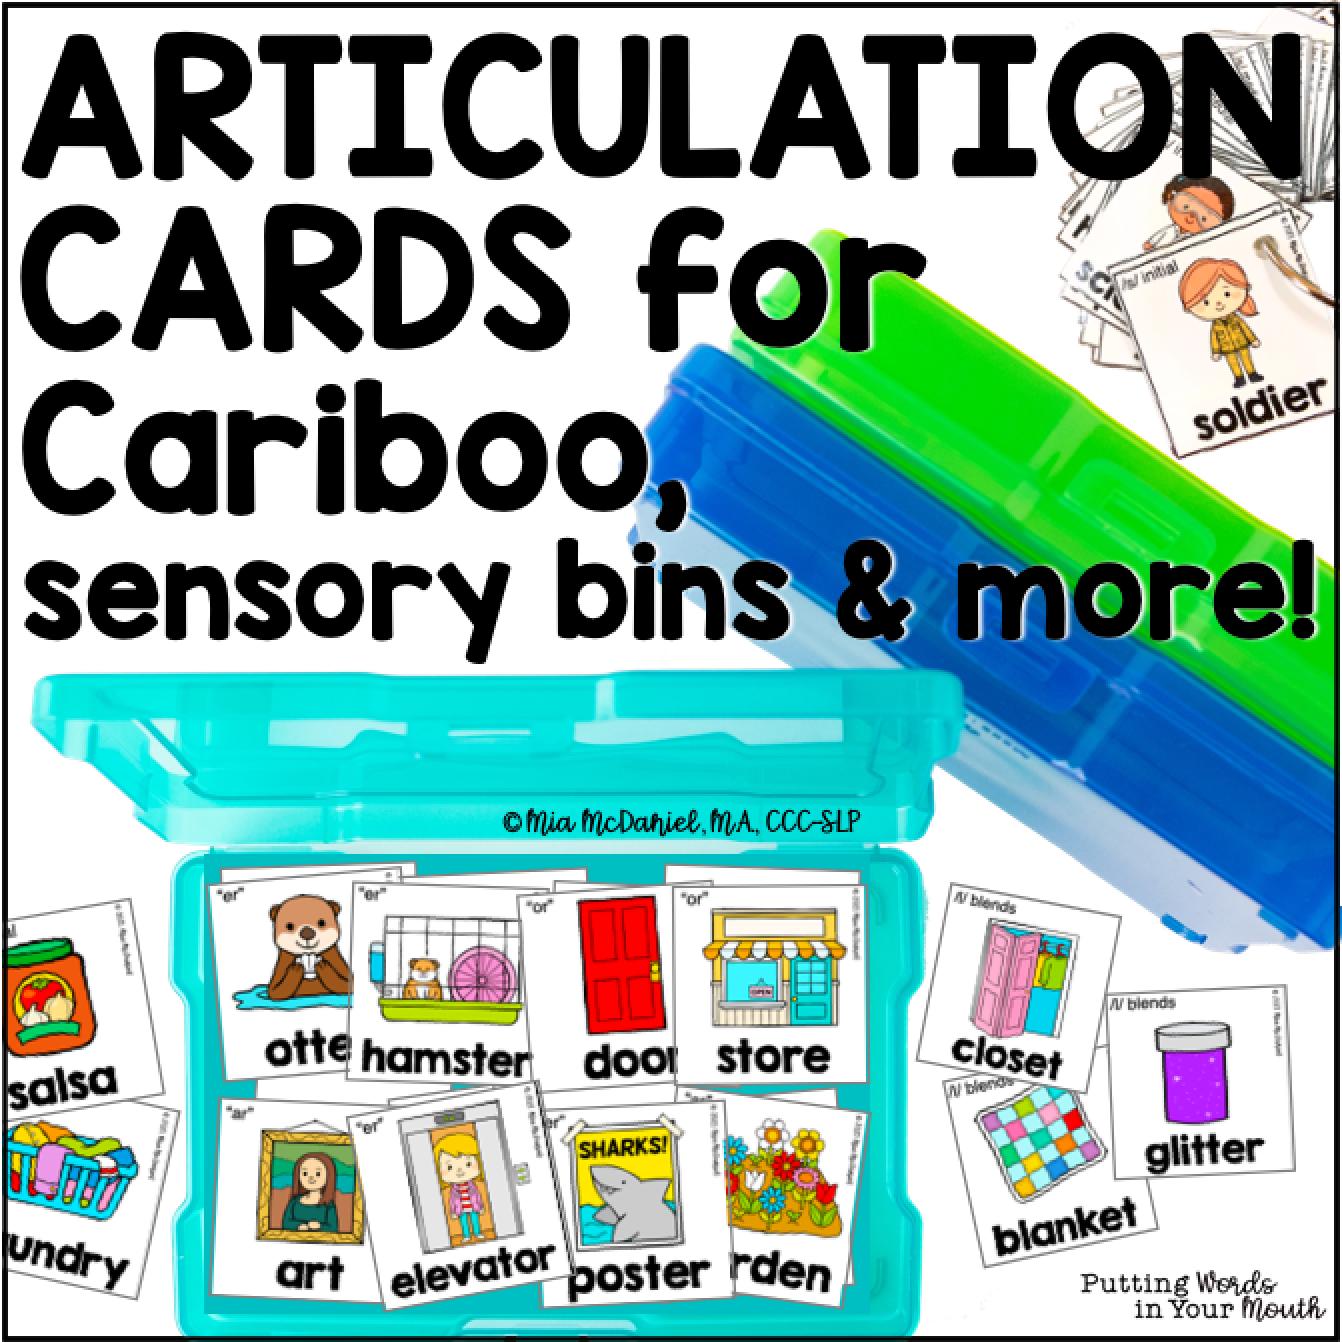 Articulation Cards for Cariboo, sensory bins & more